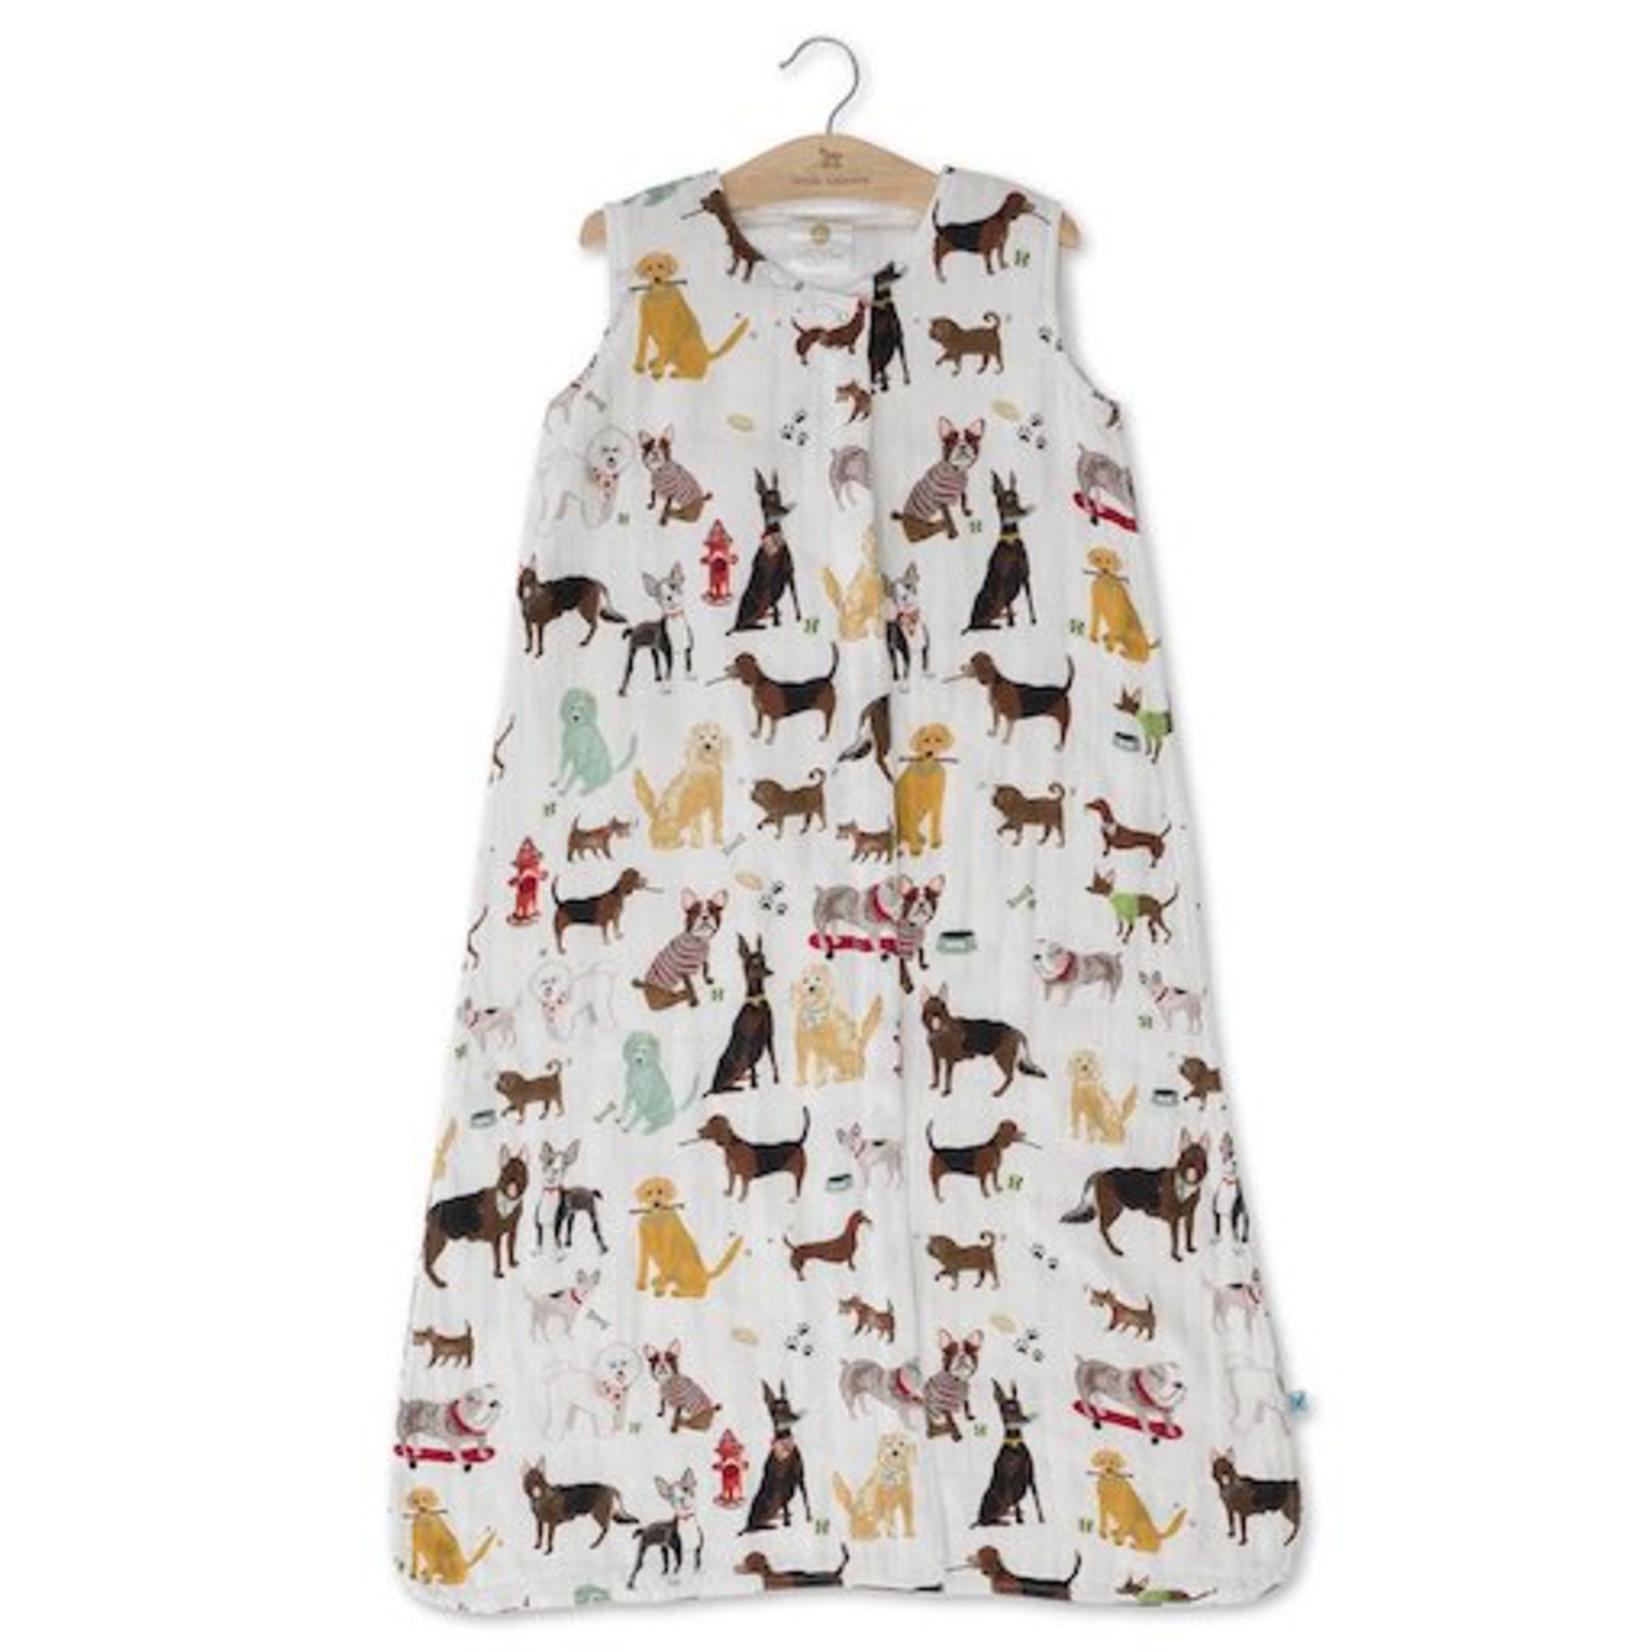 Little Unicorn Cotton Muslin Sleep Bag Small - Woof